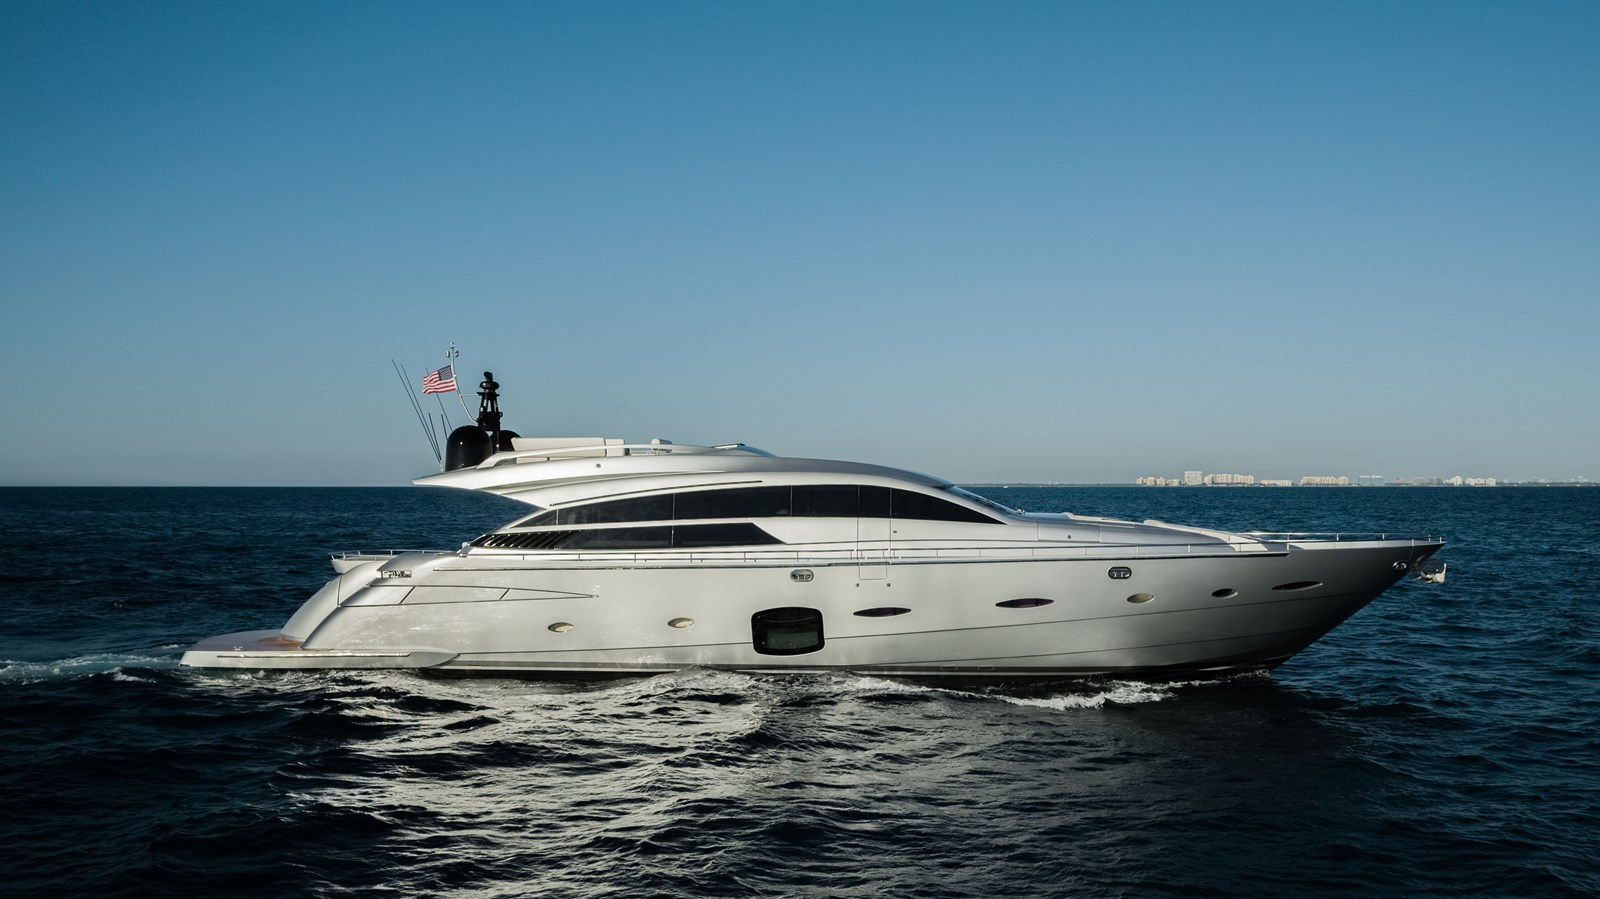 DJI_0019 2012 PERSHING  Motor Yacht 2810225